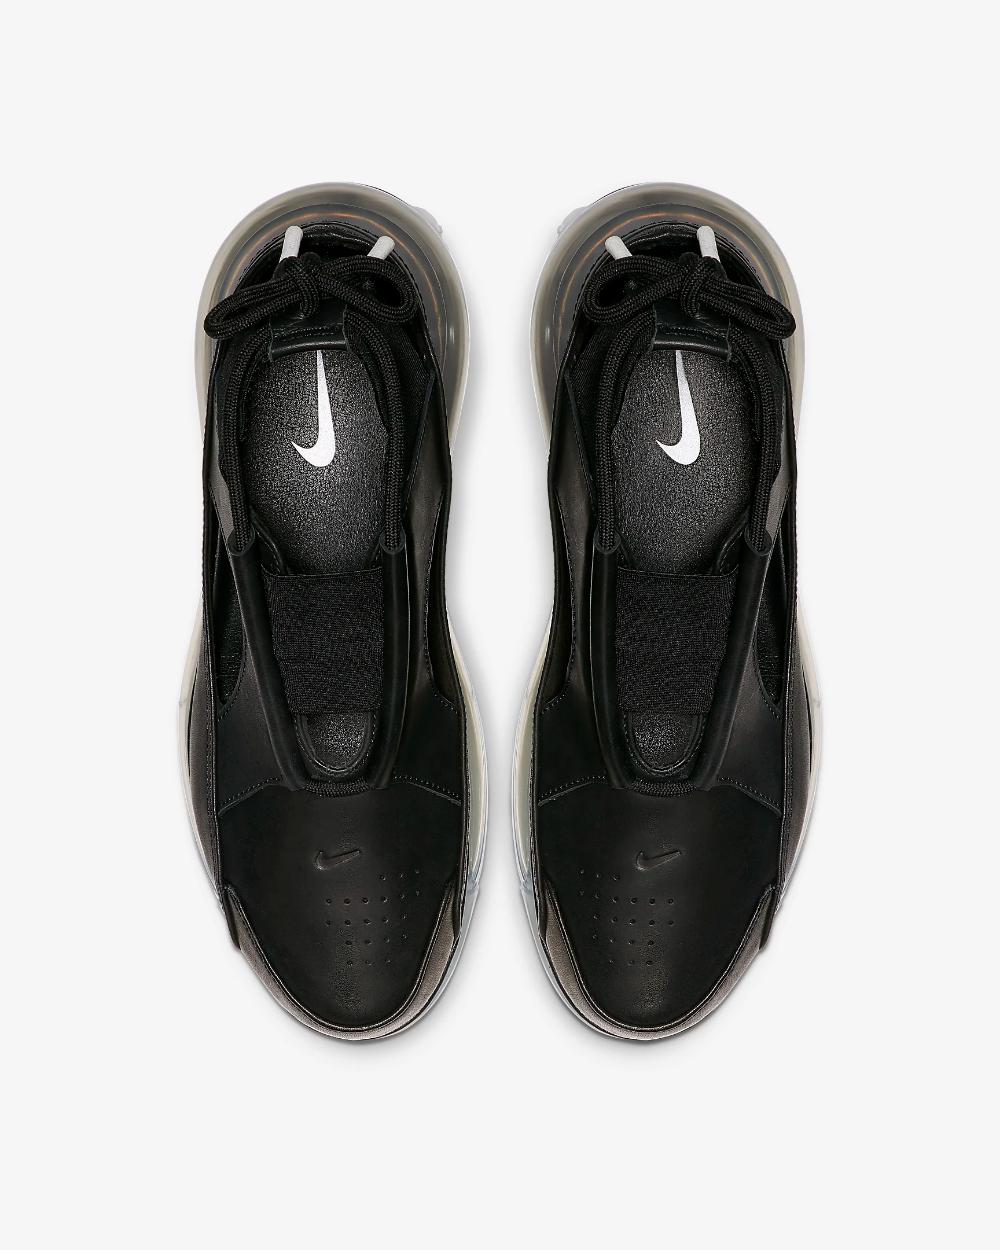 Nike Air Max Ff 720 Women S Shoe Nike Com Nike Air Max Nike Shoes Women Black Shoes Women